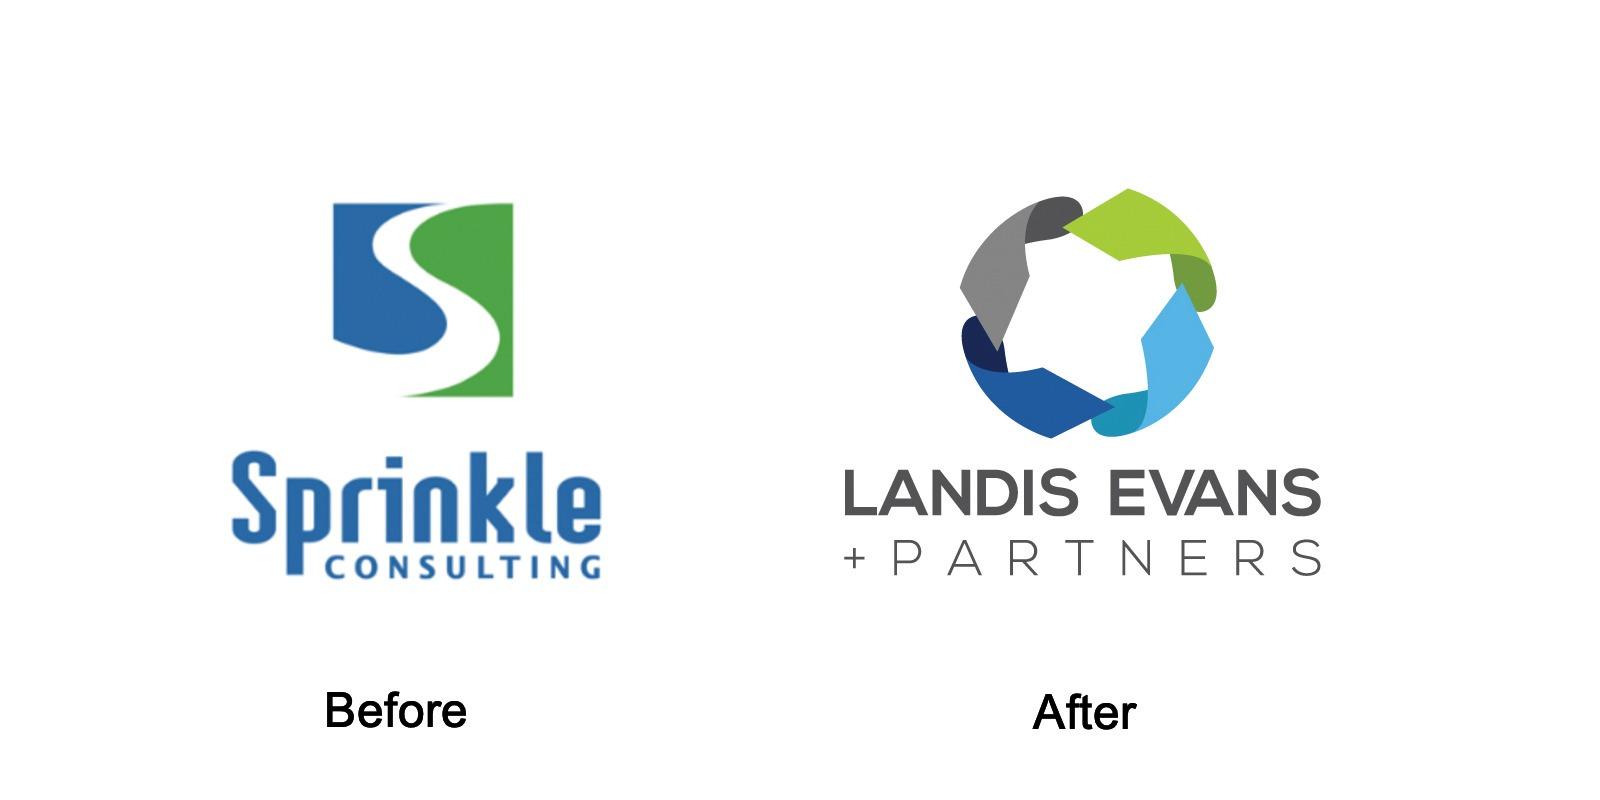 landis evans logo design